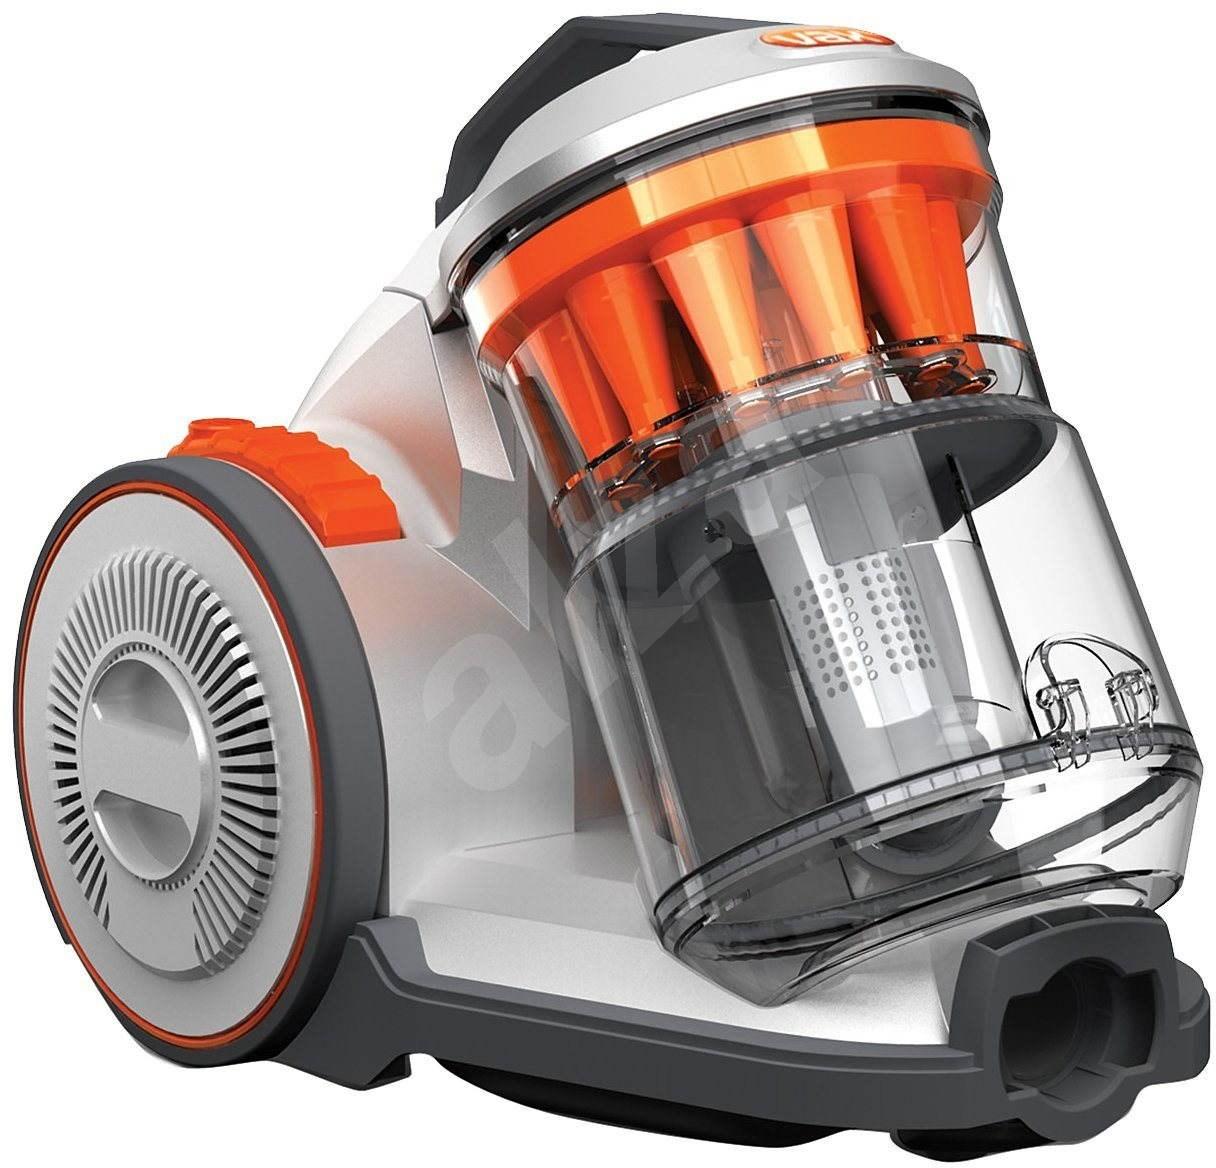 vax kompakt air c85 am be beutelloser staubsauger. Black Bedroom Furniture Sets. Home Design Ideas